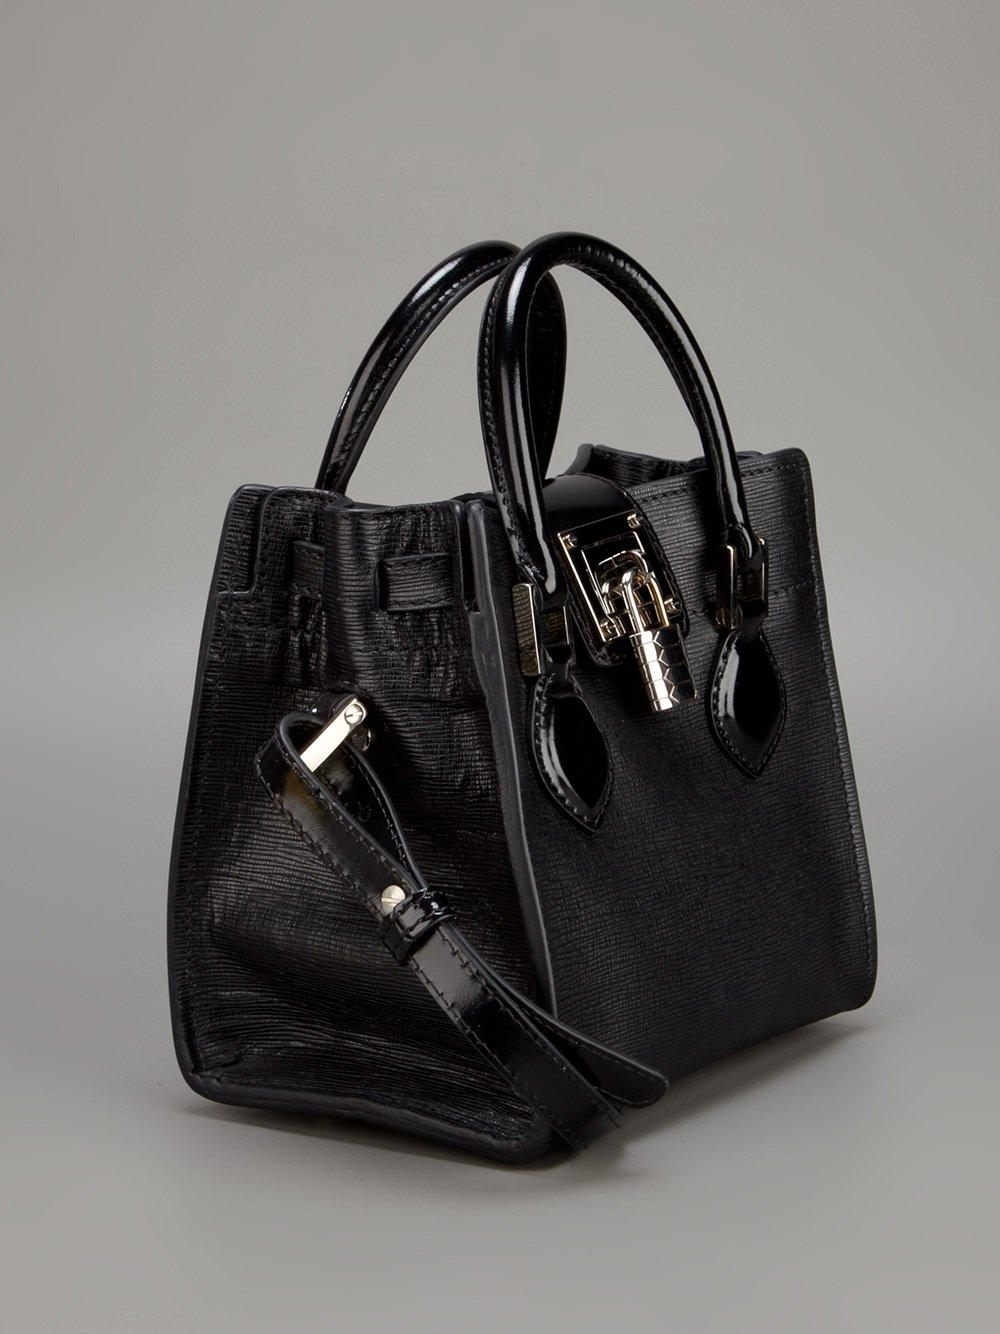 Lyst - Roberto Cavalli Florence Bag in Black e047a297b